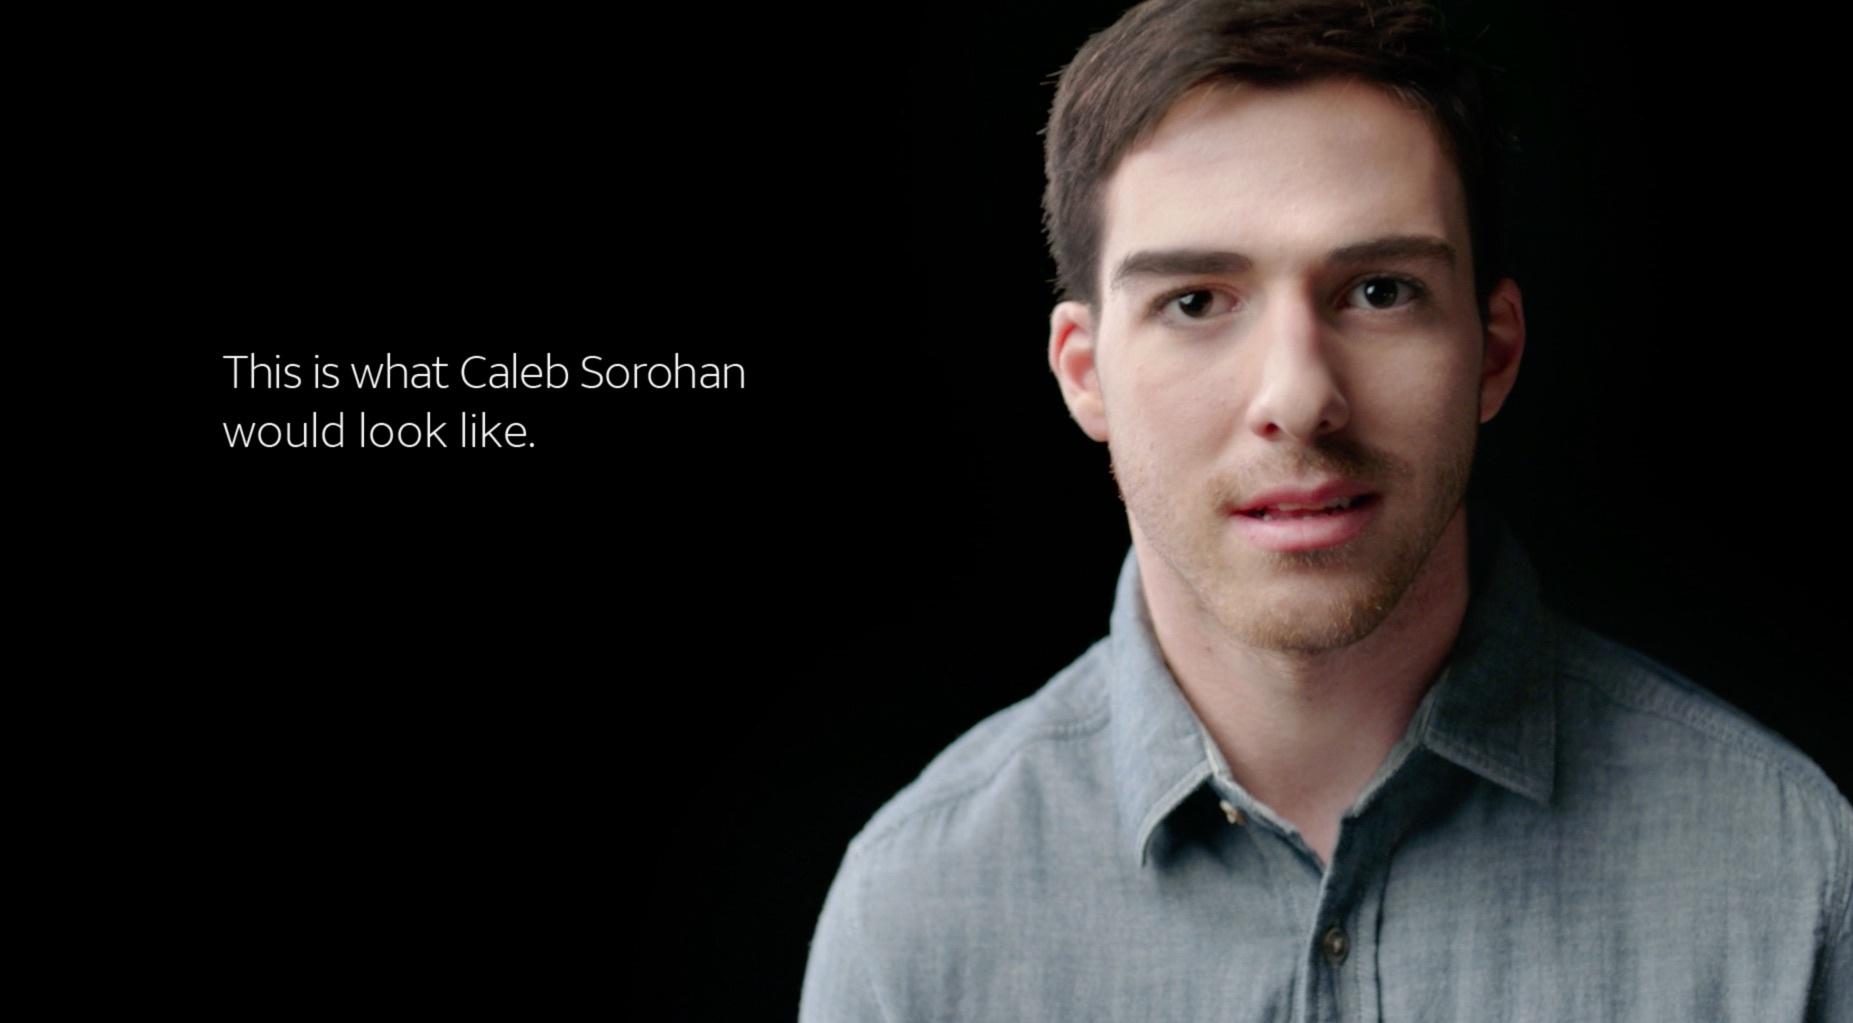 Thumbnail for Caleb